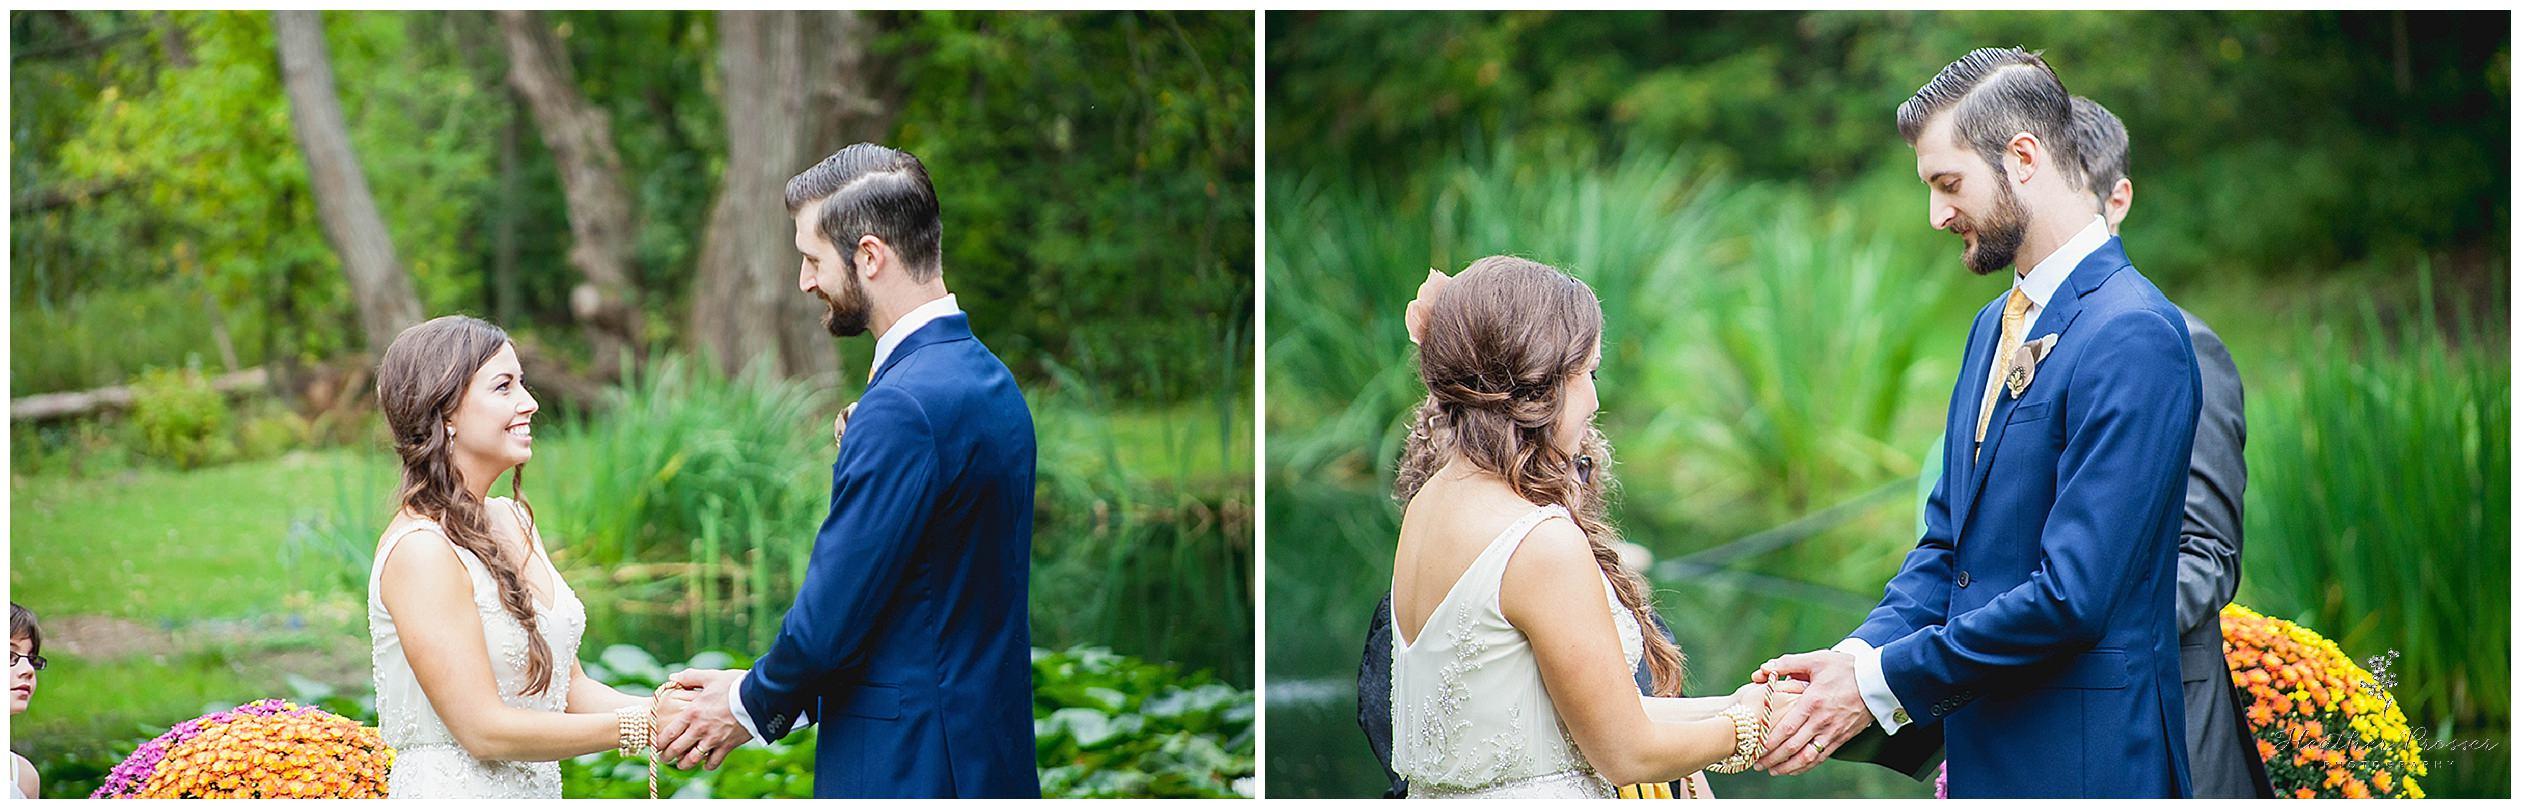 Bowmanville Wedding Photography_0195.jpg